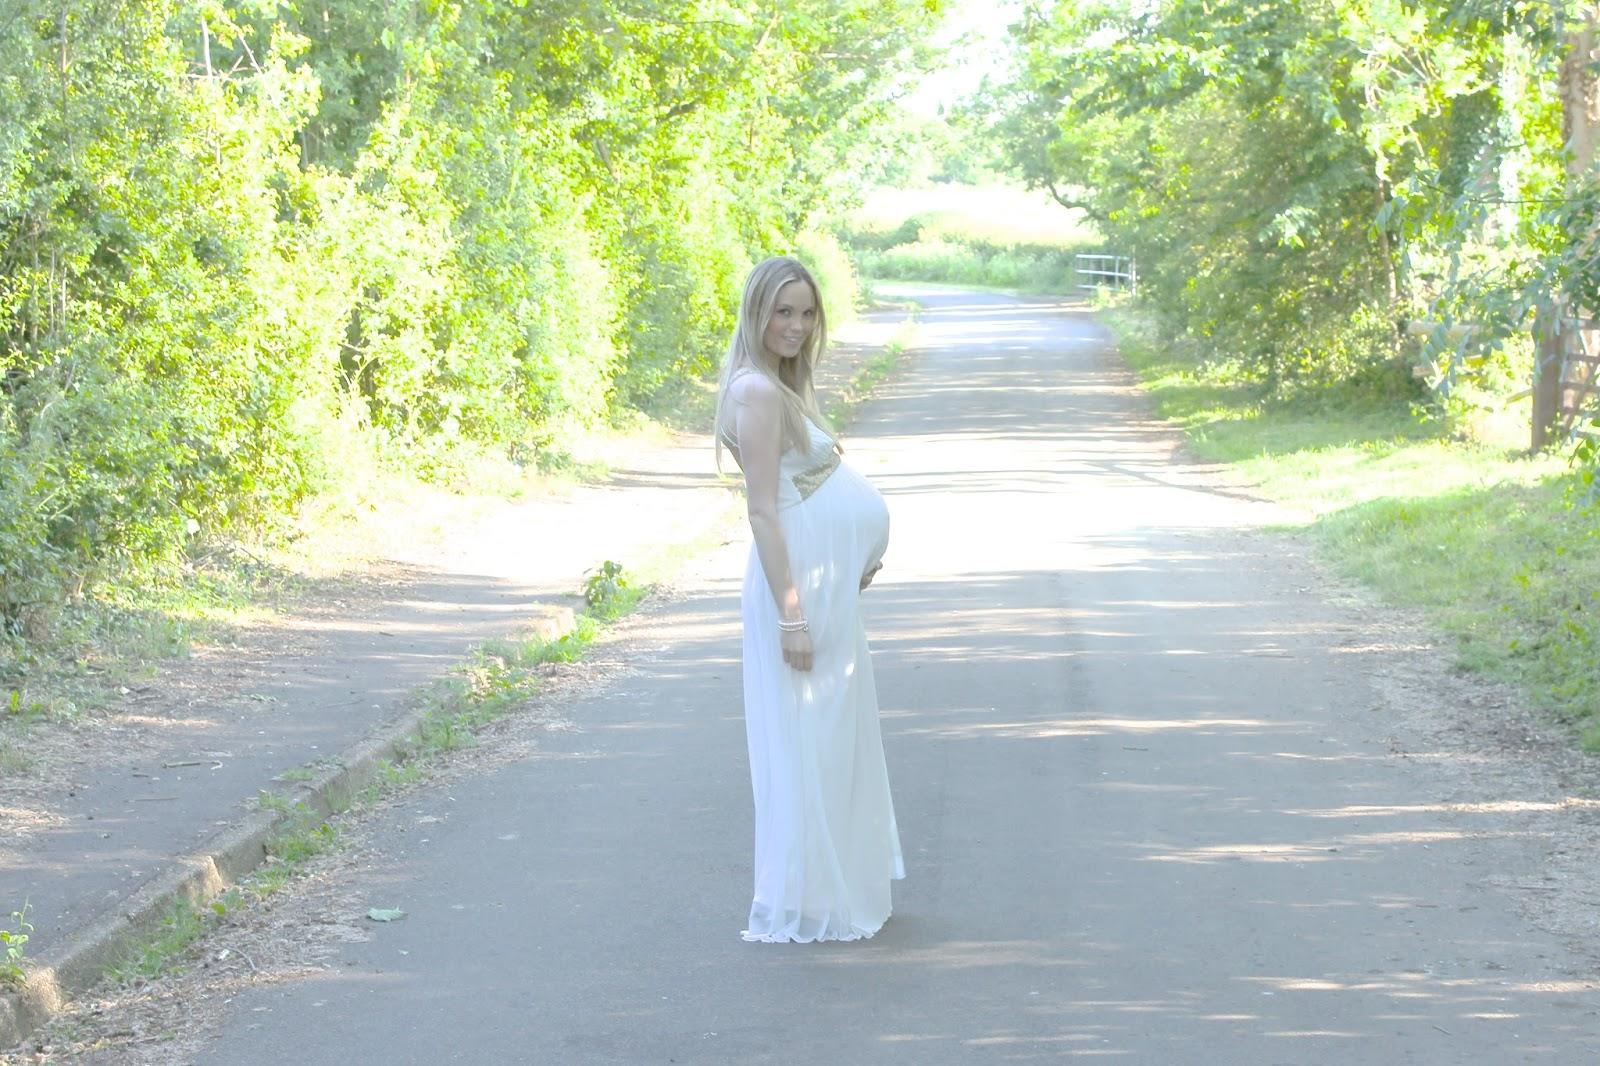 DIY Maternity Photographs, Maternity photos, Maternity photoshoot, 38 week bump, Maternity photos at 38 weeks